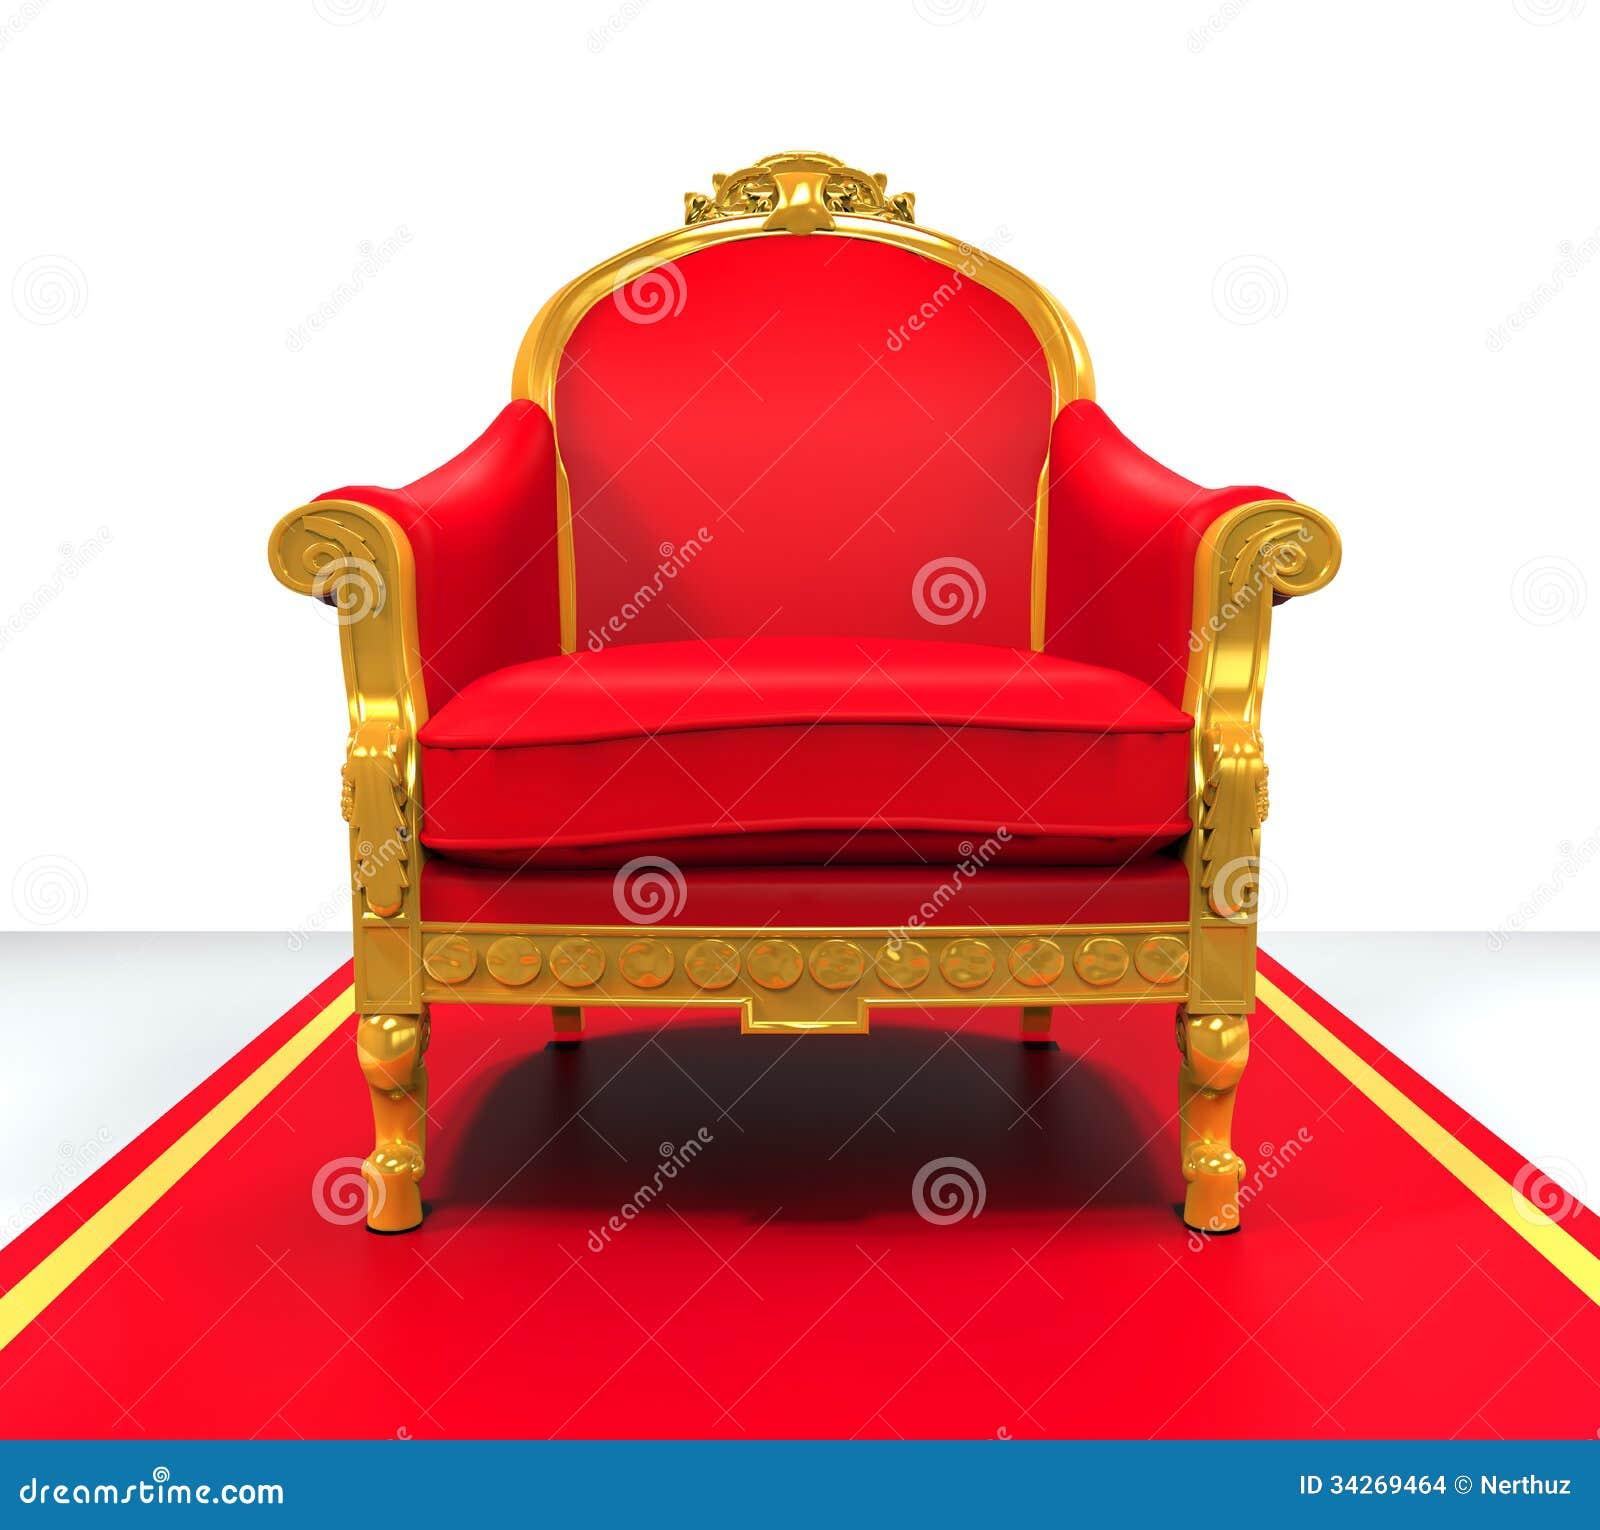 Rey Throne Chair